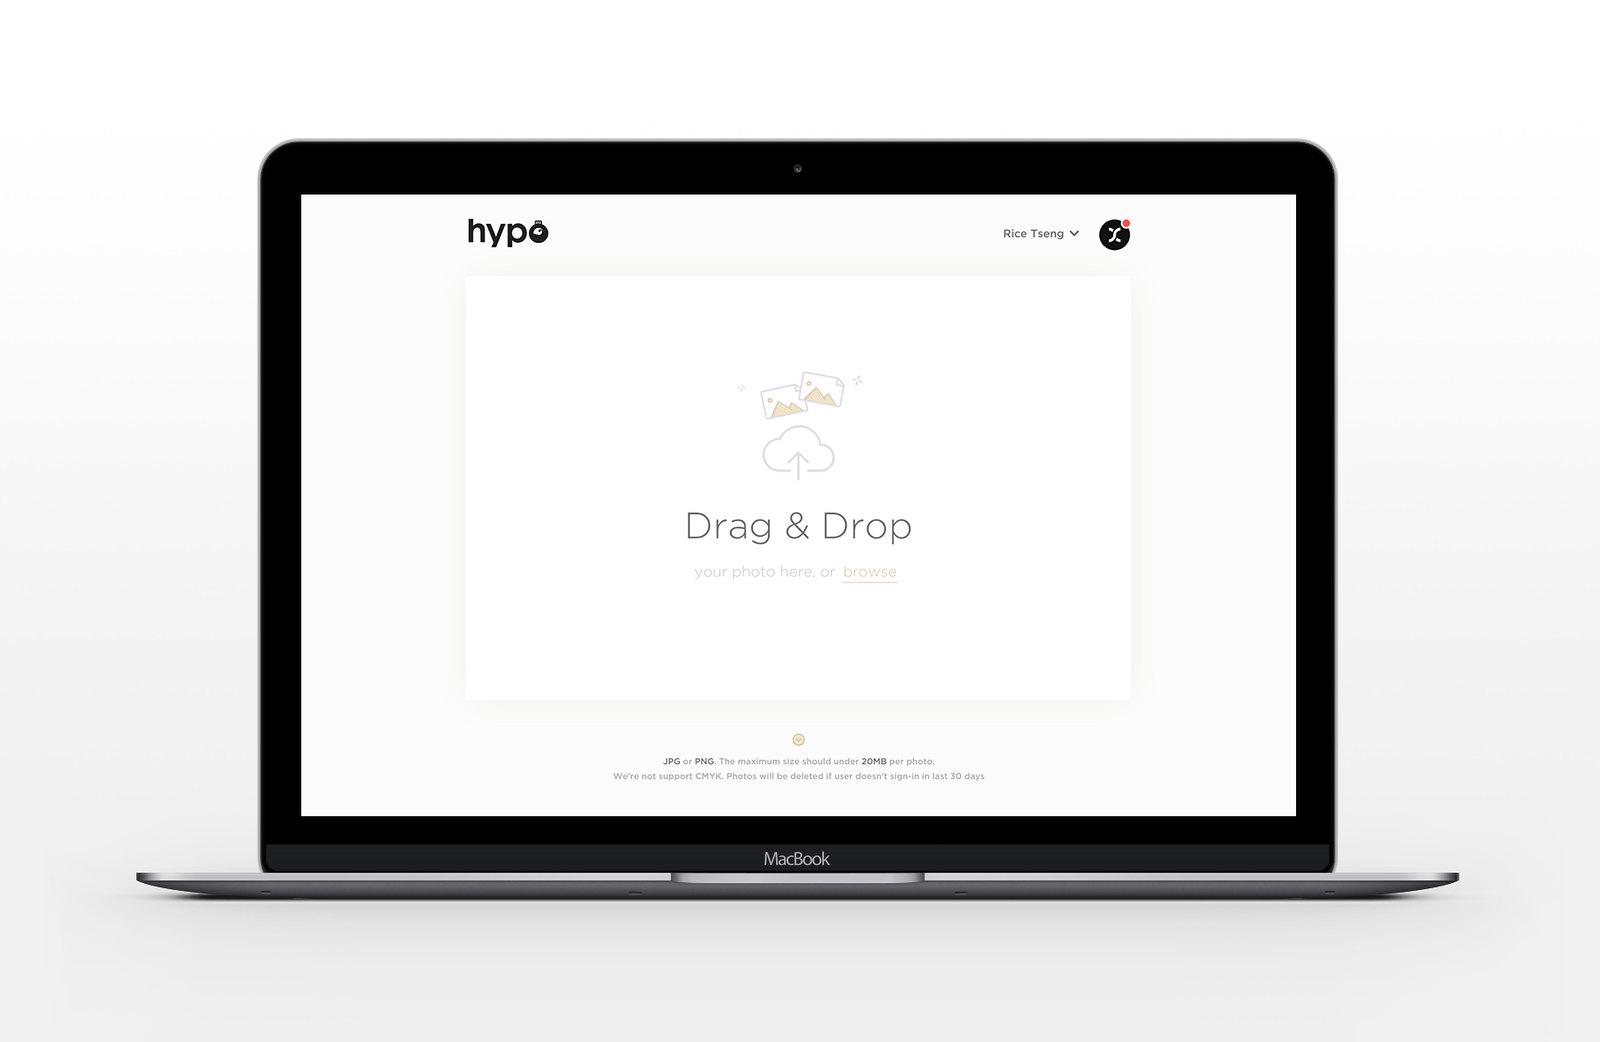 hypo new uploader